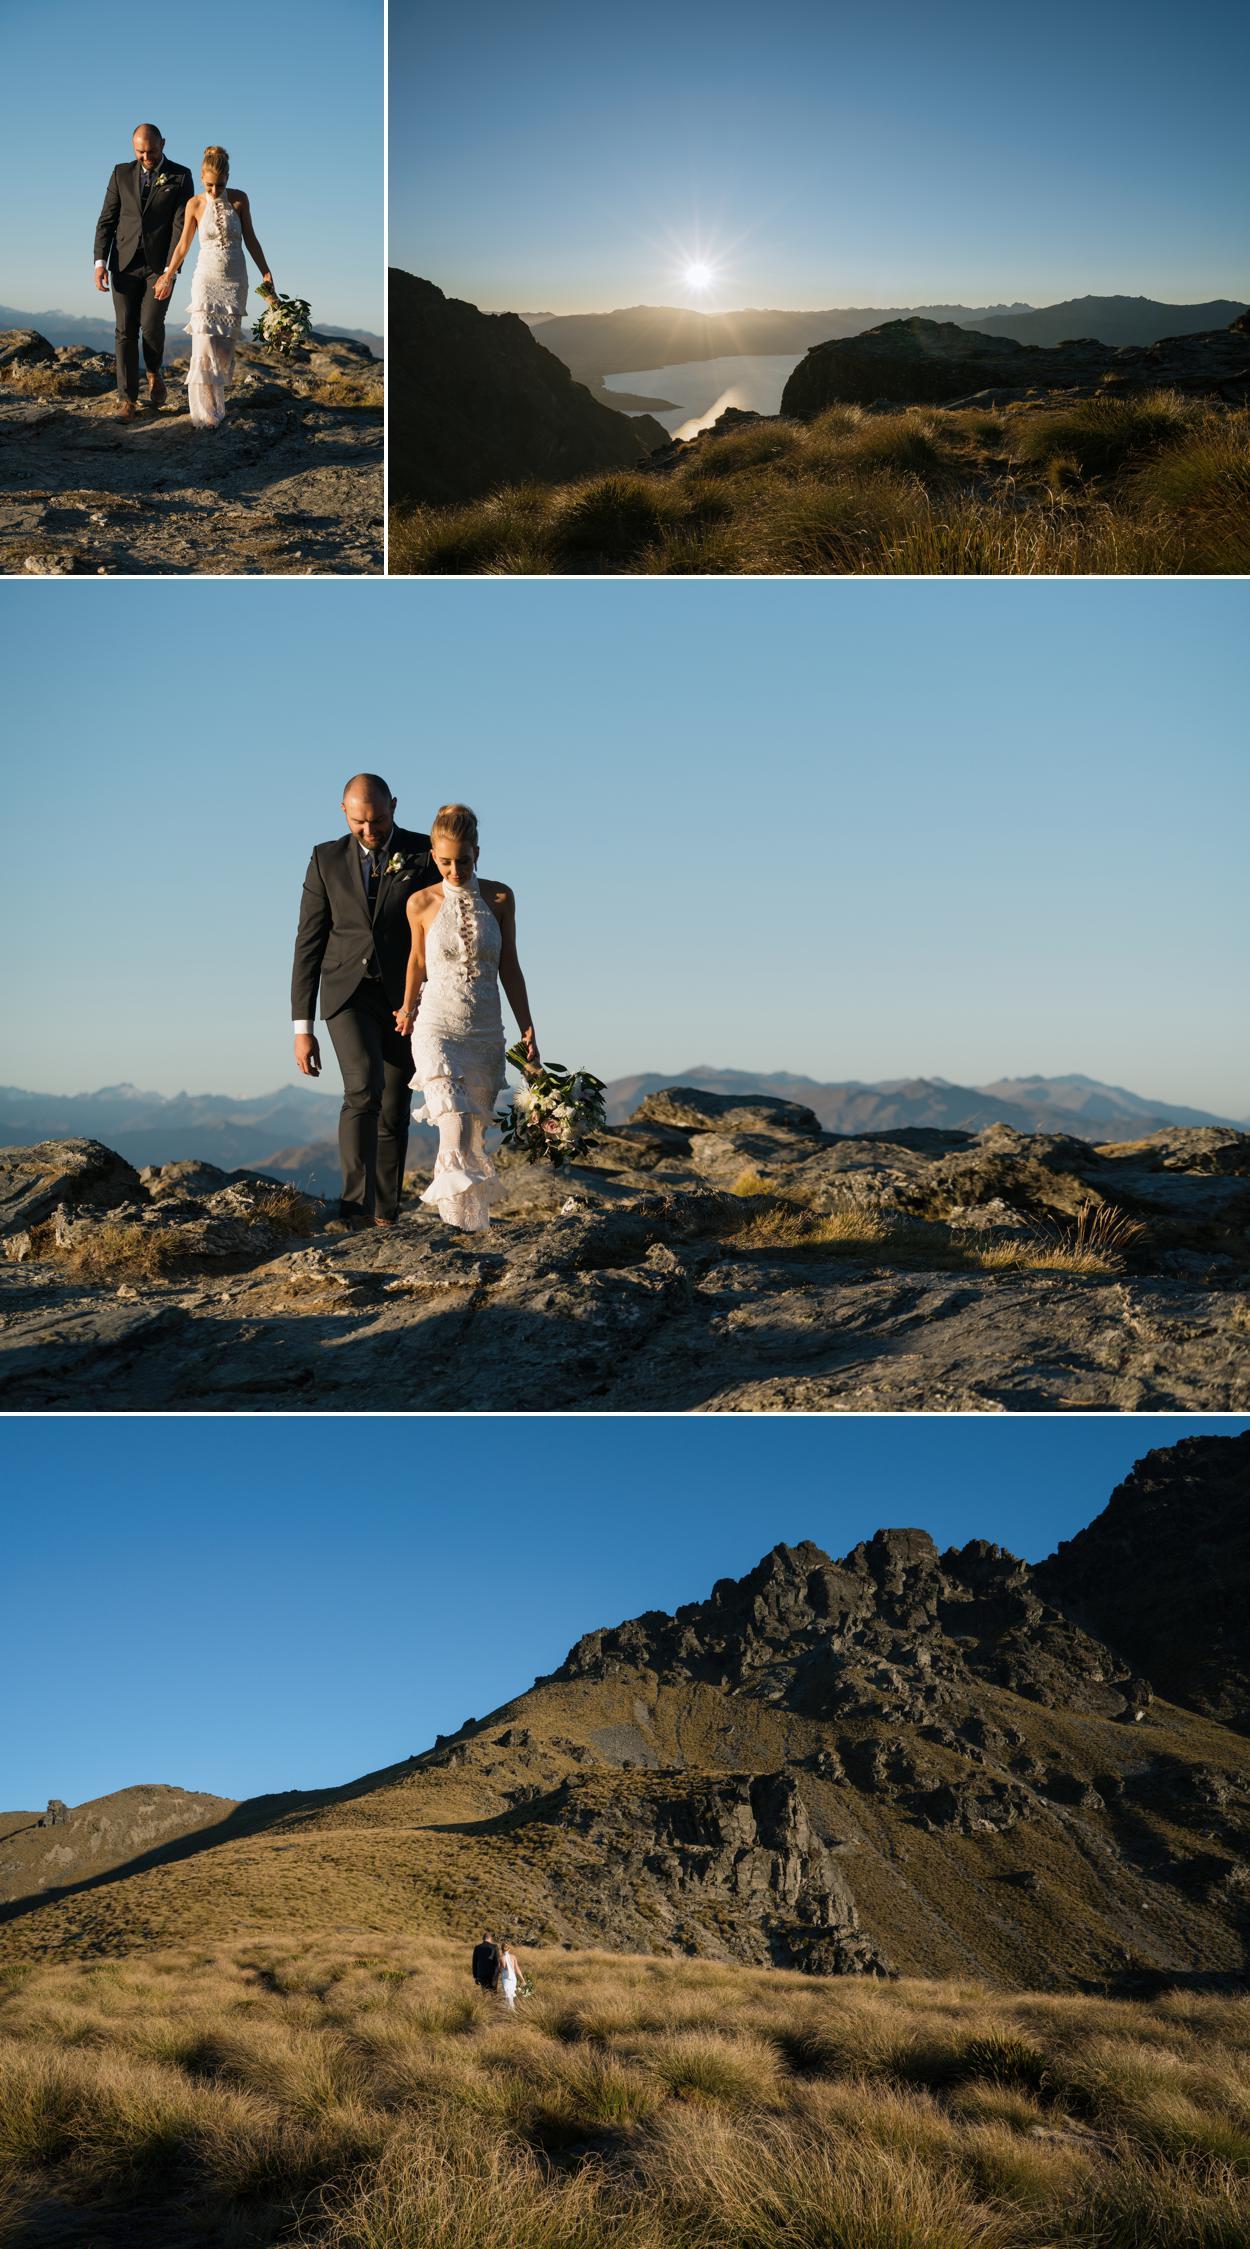 sunset mountain wedding photographer